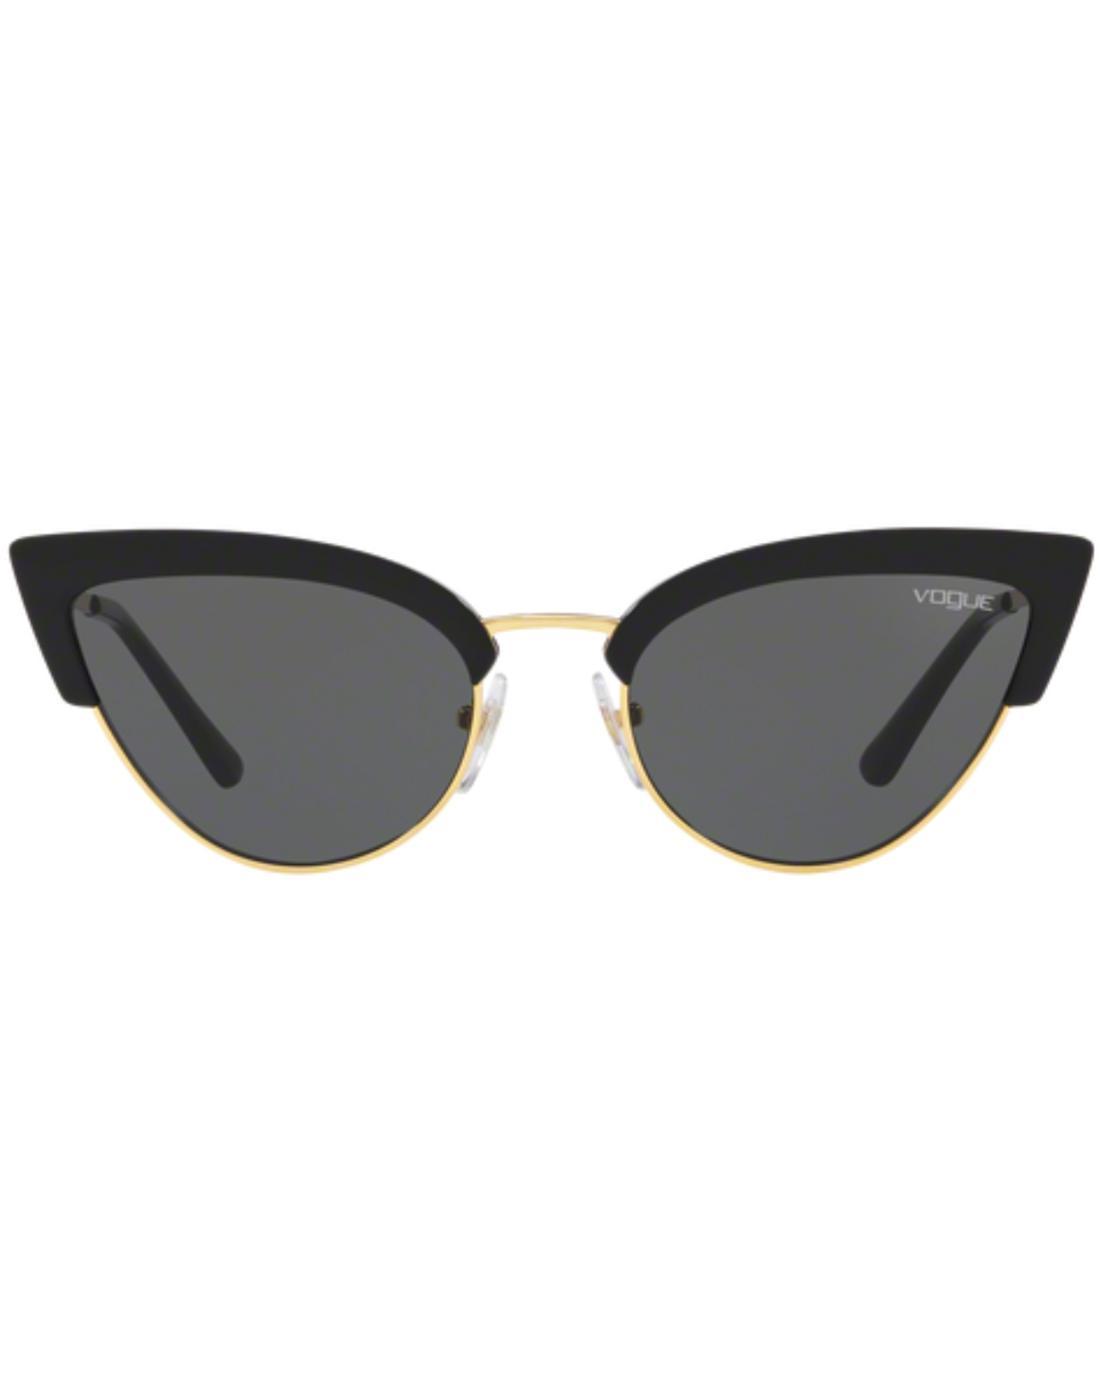 VOGUE Retro 50s Vintage Cats-Eye Sunglasses Black